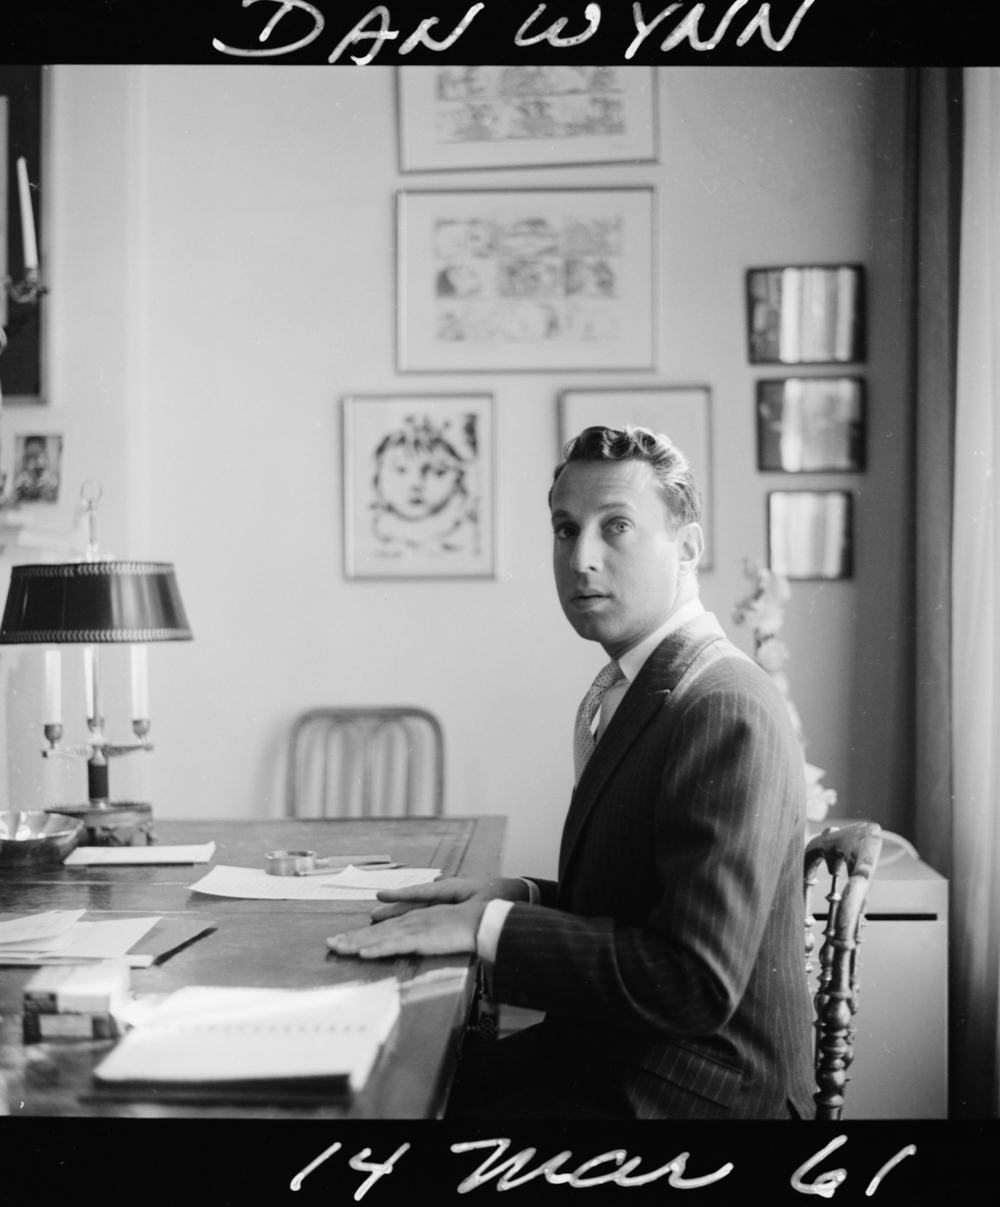 Scazzi, 1961